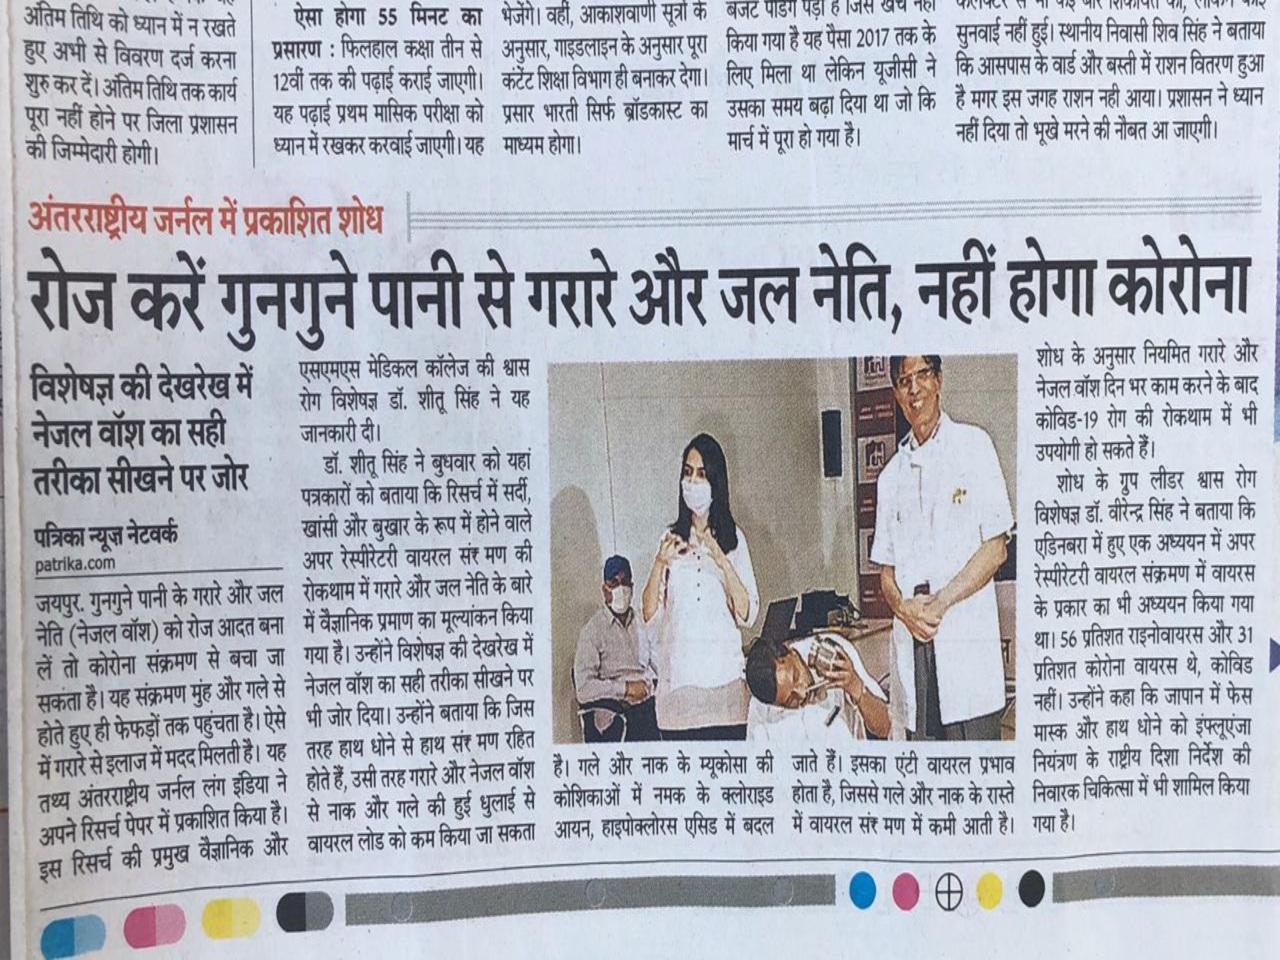 http://www.drsheetusingh.com/wp-content/uploads/2019/12/Rajasthan-Patrika-5-7-2020.jpg